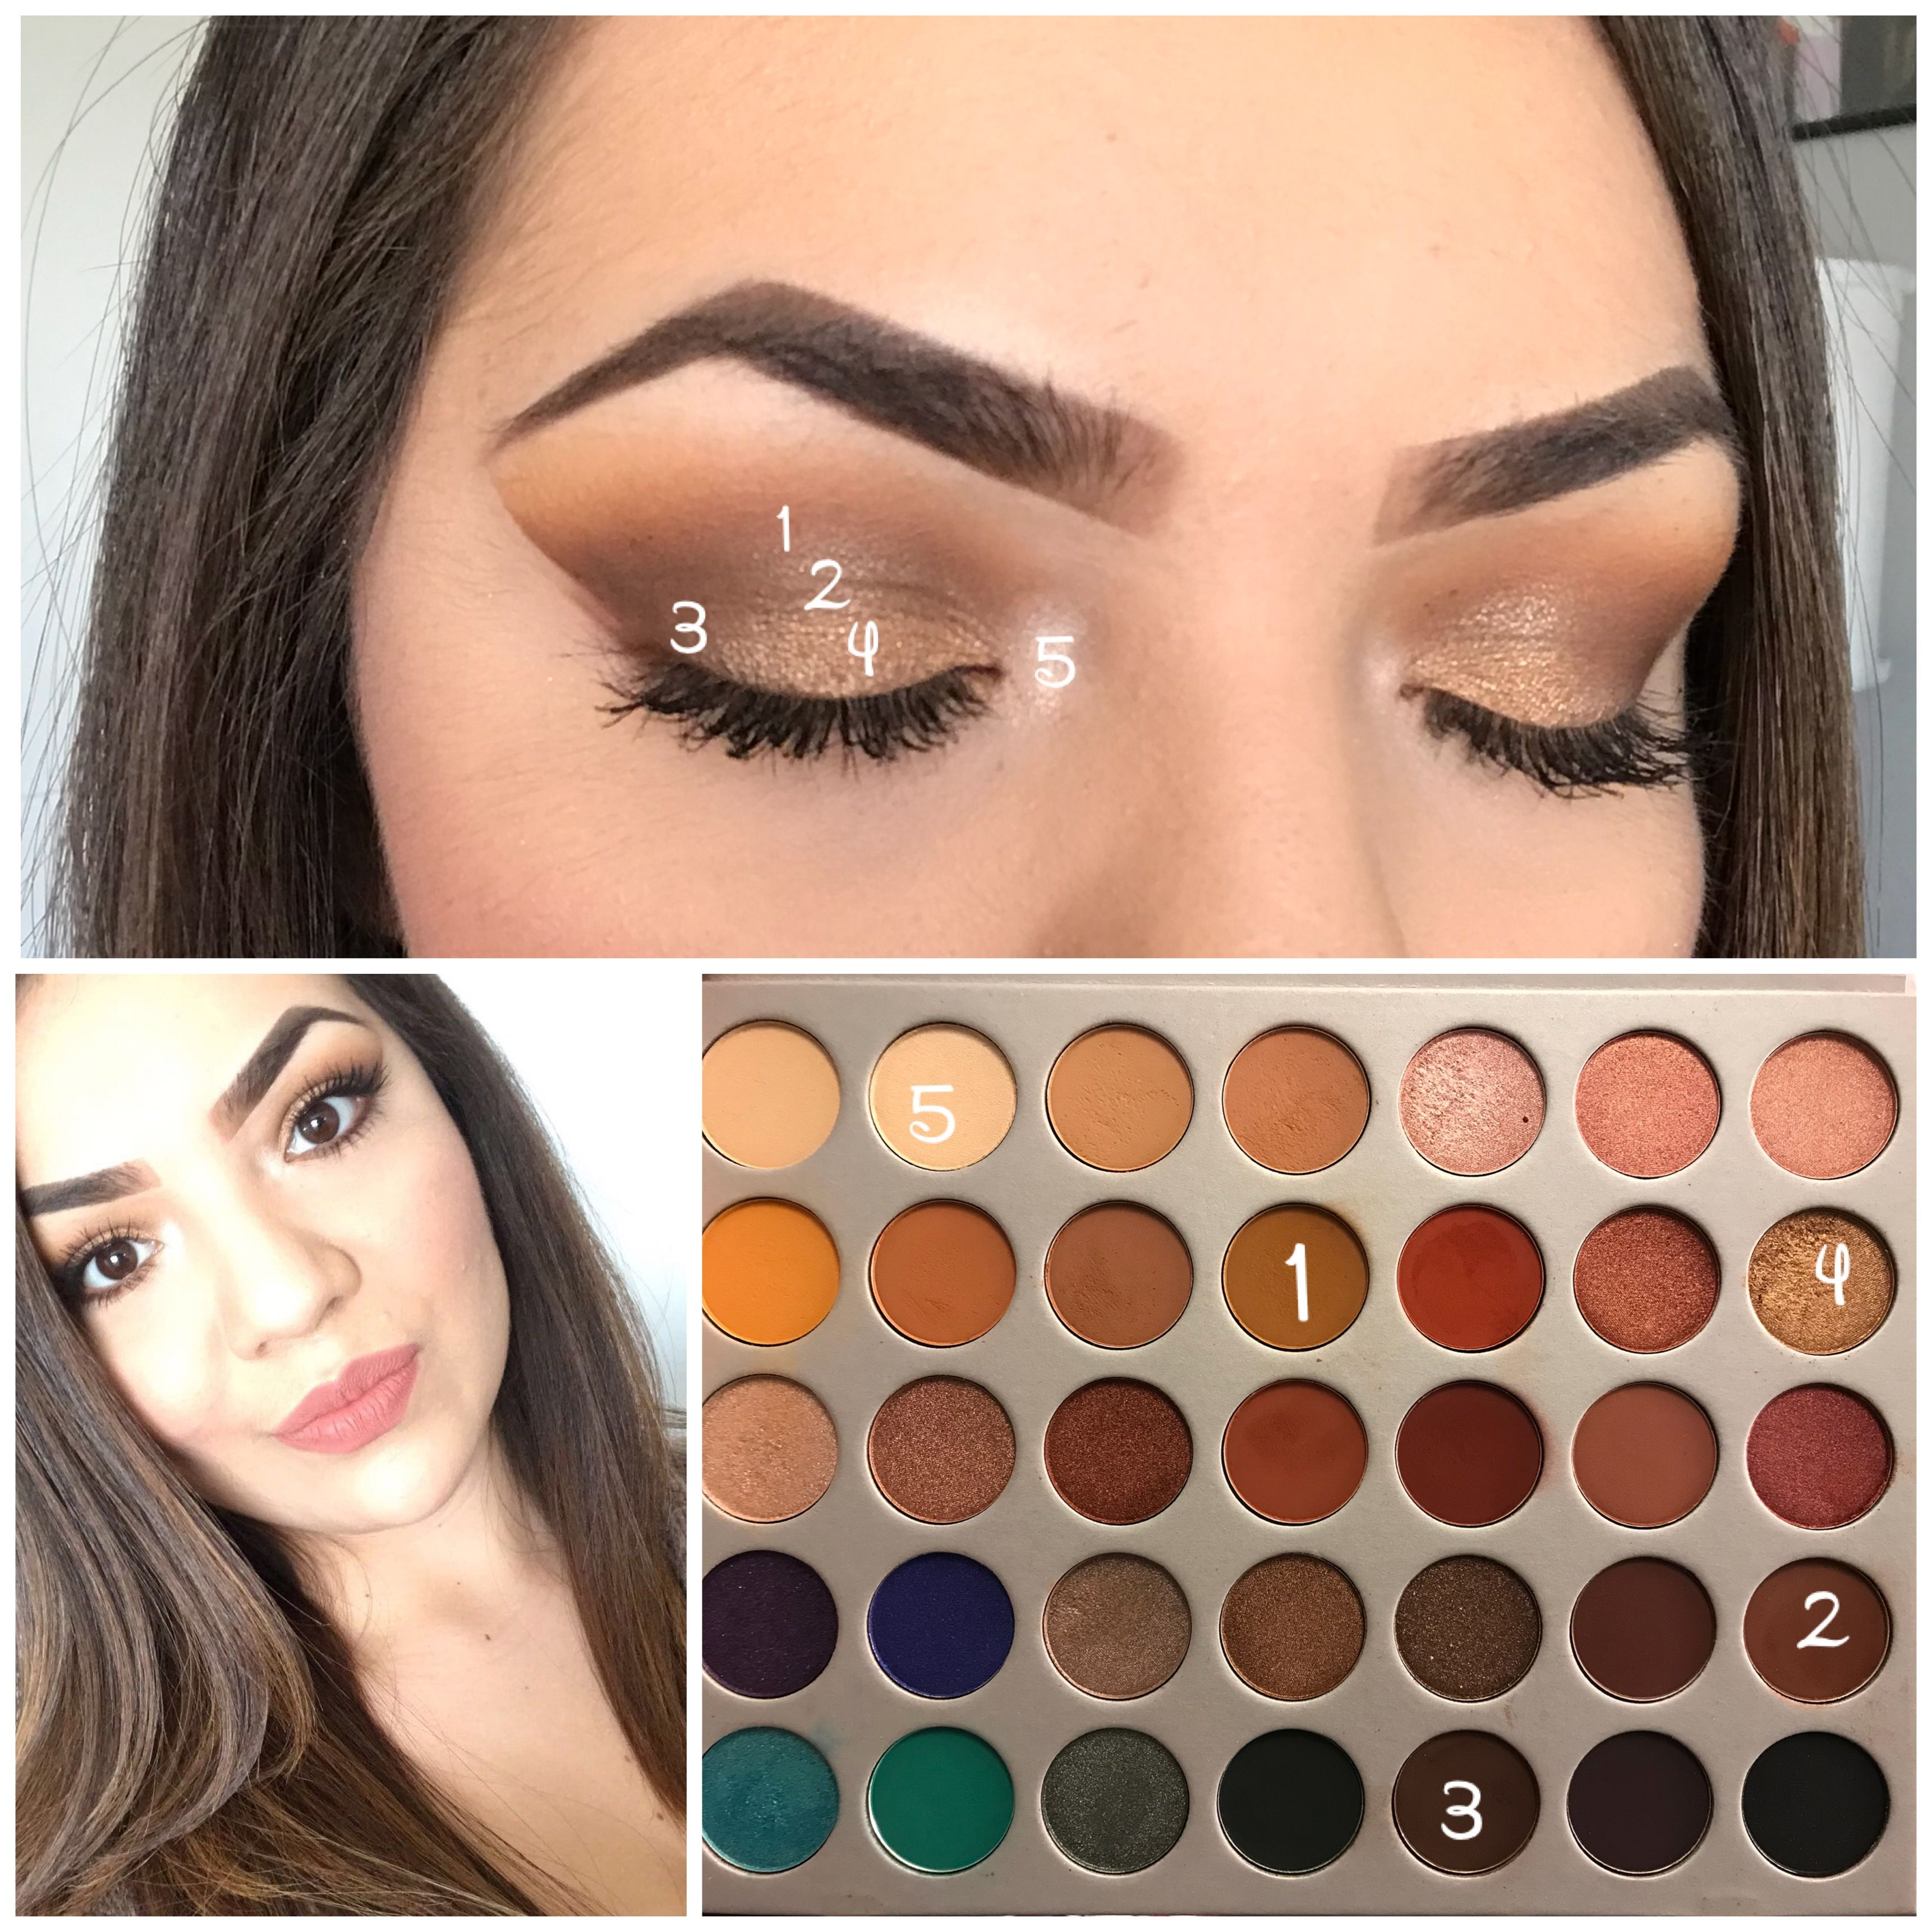 Jaclyn Hill Makeup Morphe JaclynHillPalette Makeup